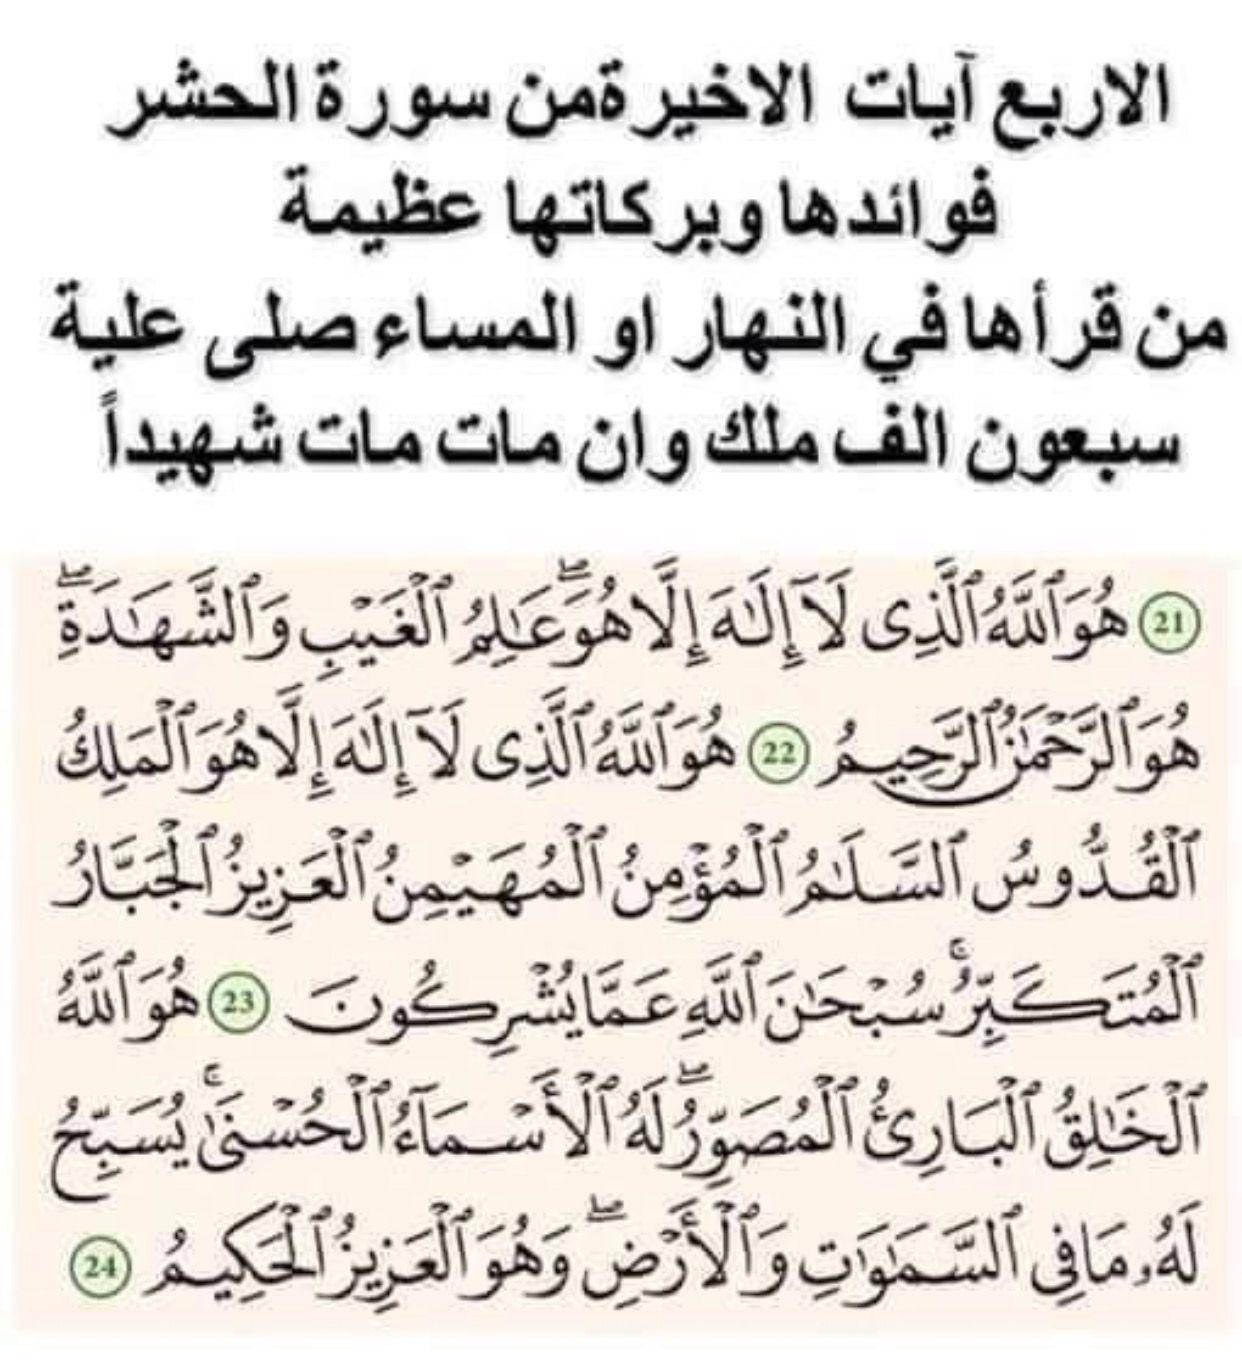 اواخر سورة الحشر وفوائدها العظيمه Islamic Quotes Quotes Arabic Love Quotes